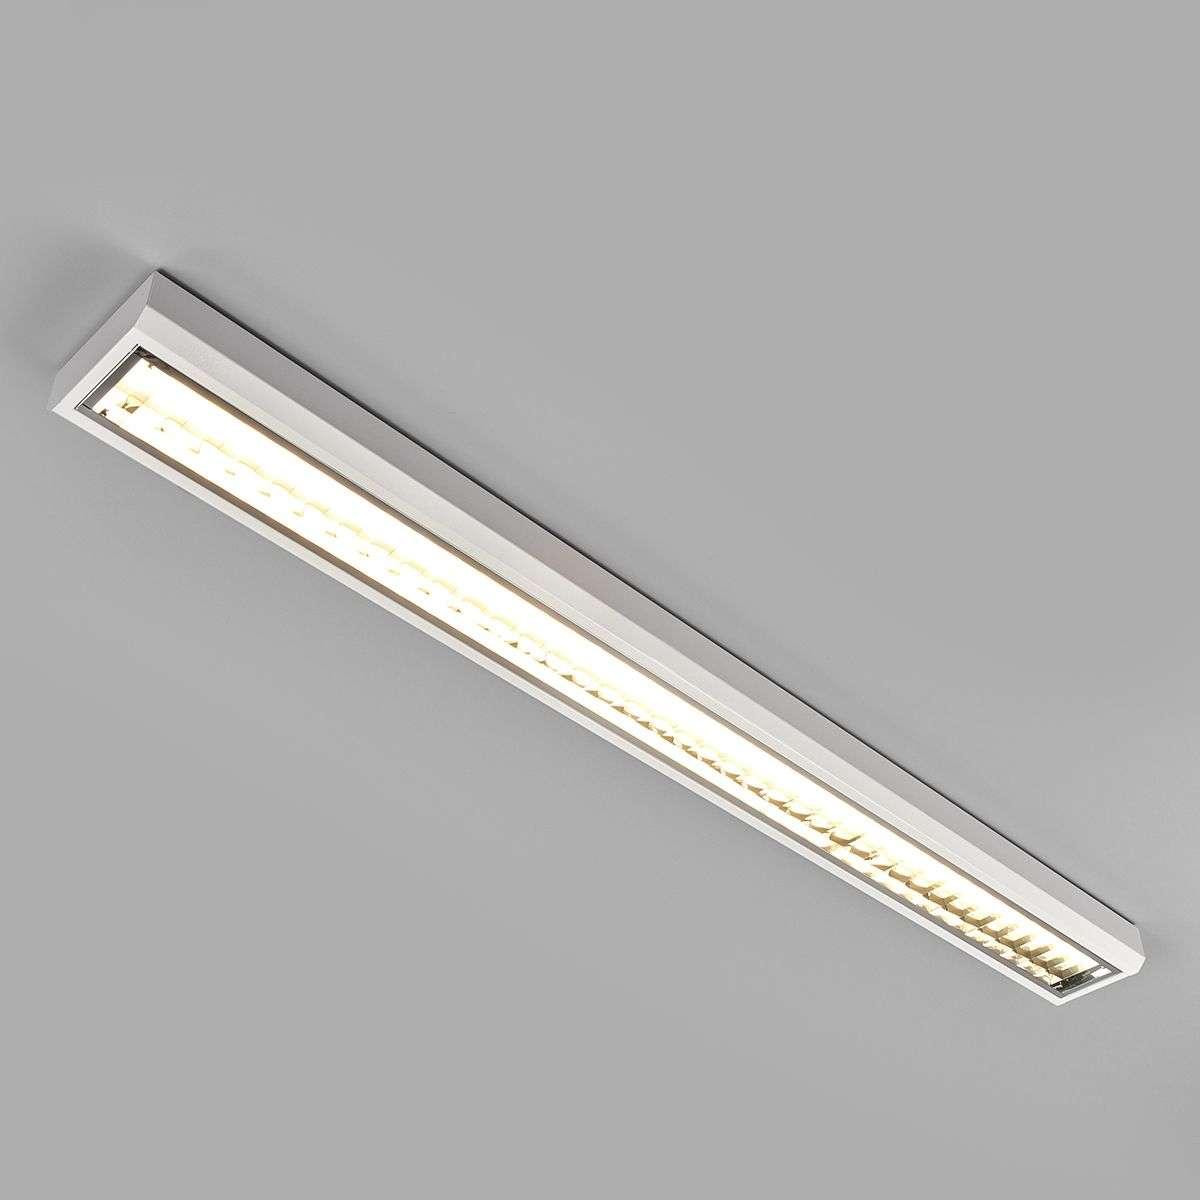 parabolic light fixtures office lighting. LED Louvre Light For Offices, 33 W, 4000 K-3002146-31 Parabolic Fixtures Office Lighting U